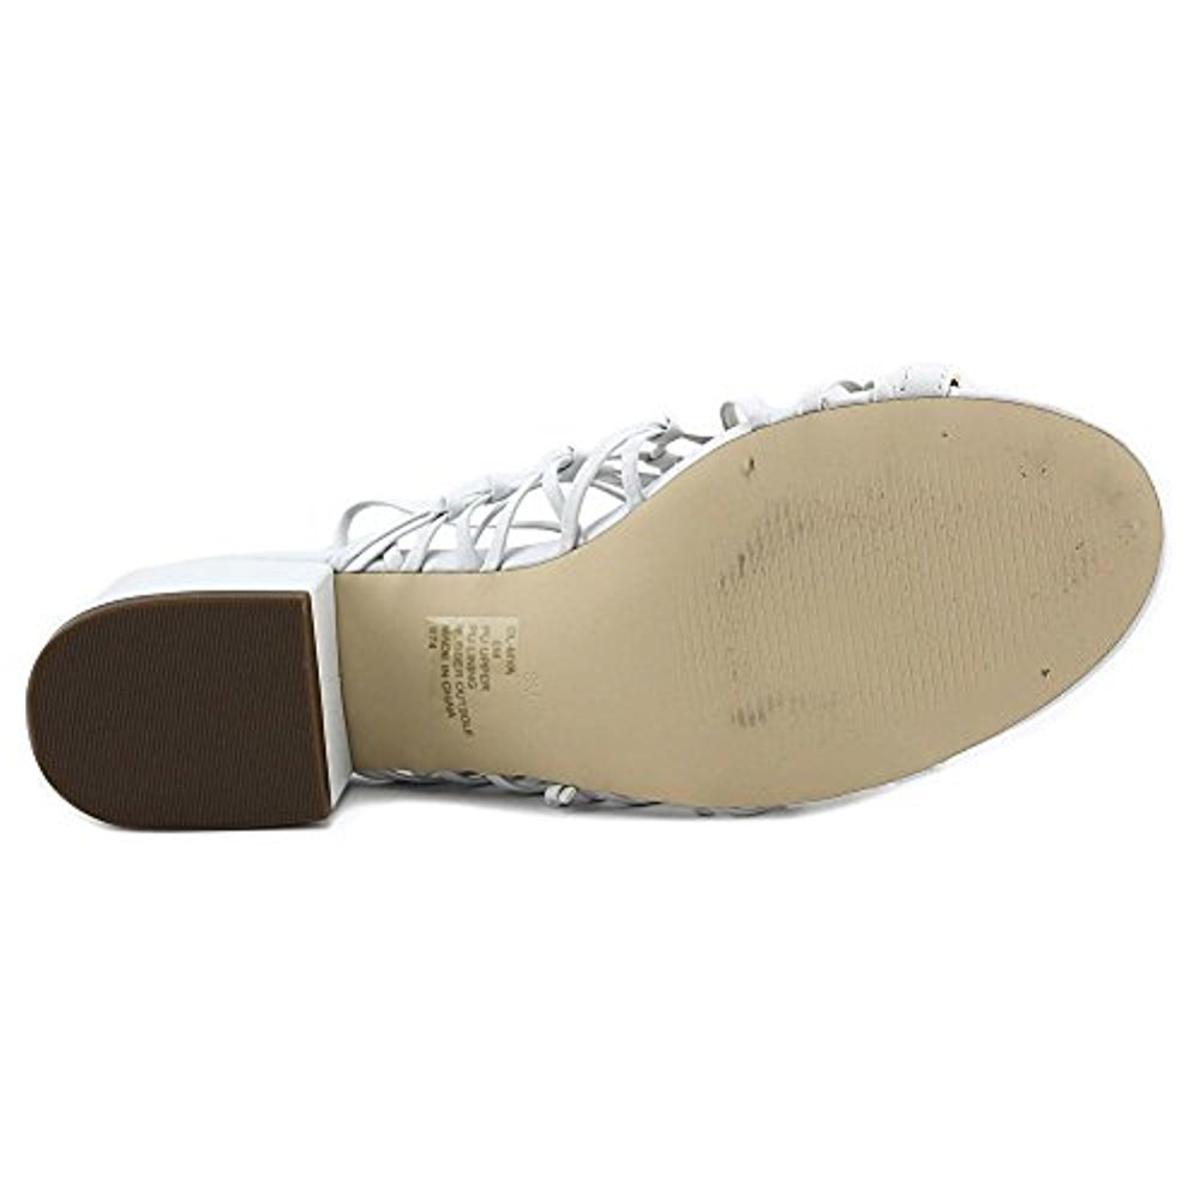 Design-Lab-Womens-Mya-Wrap-Open-Toe-Dress-Heels-Shoes-BHFO-2941 thumbnail 19